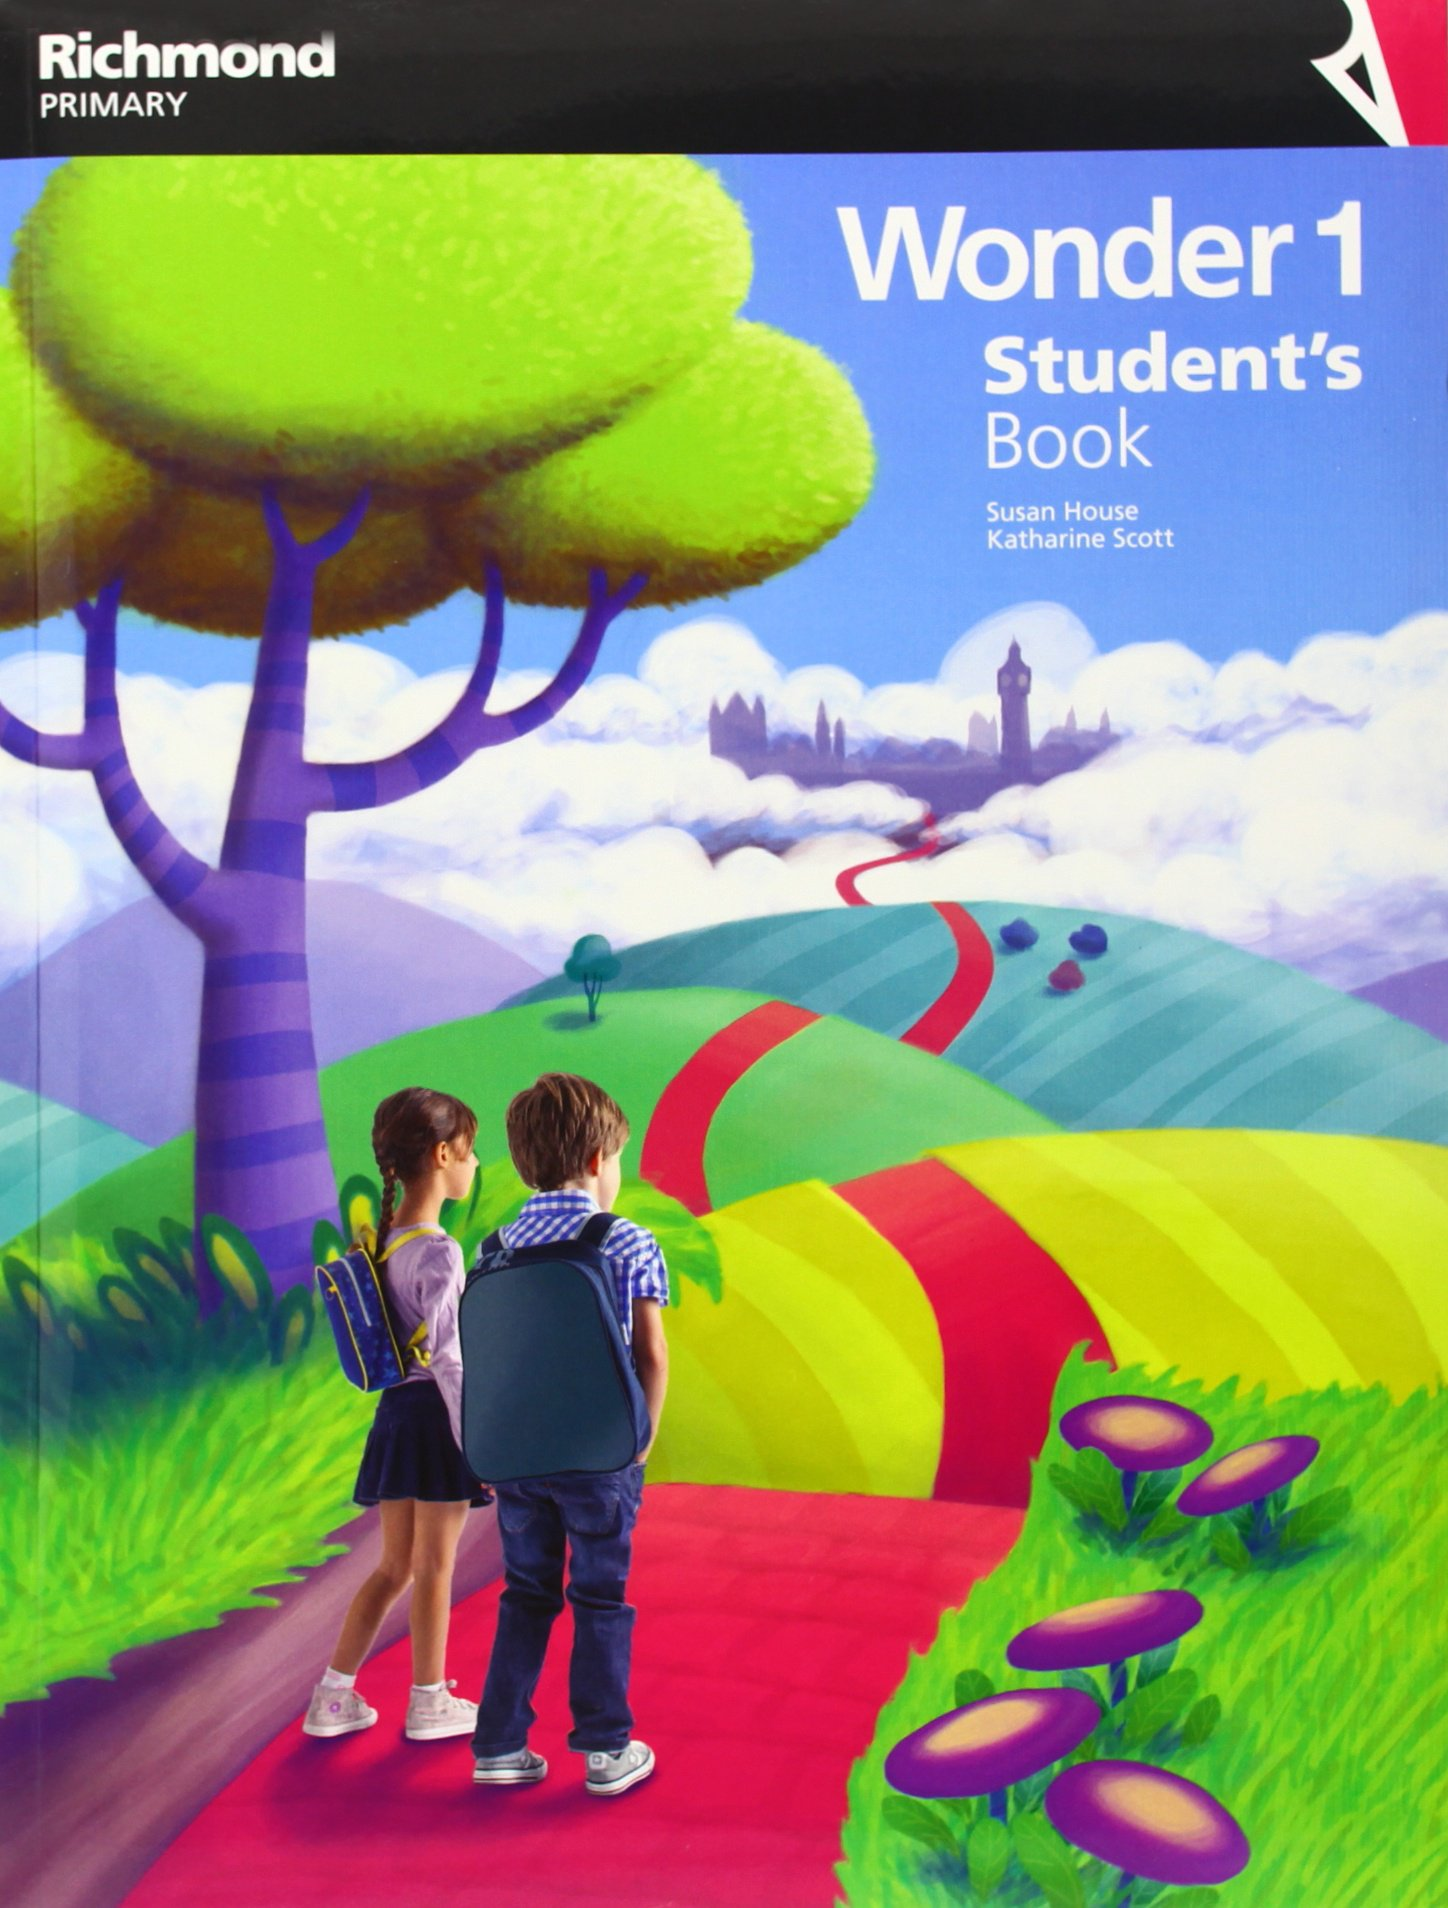 WONDER 1 STUDENT'S BOOK - 9788466817189 Tapa blanda – 8 abr 2014 Aa.Vv. Richmond 8466817182 YQ